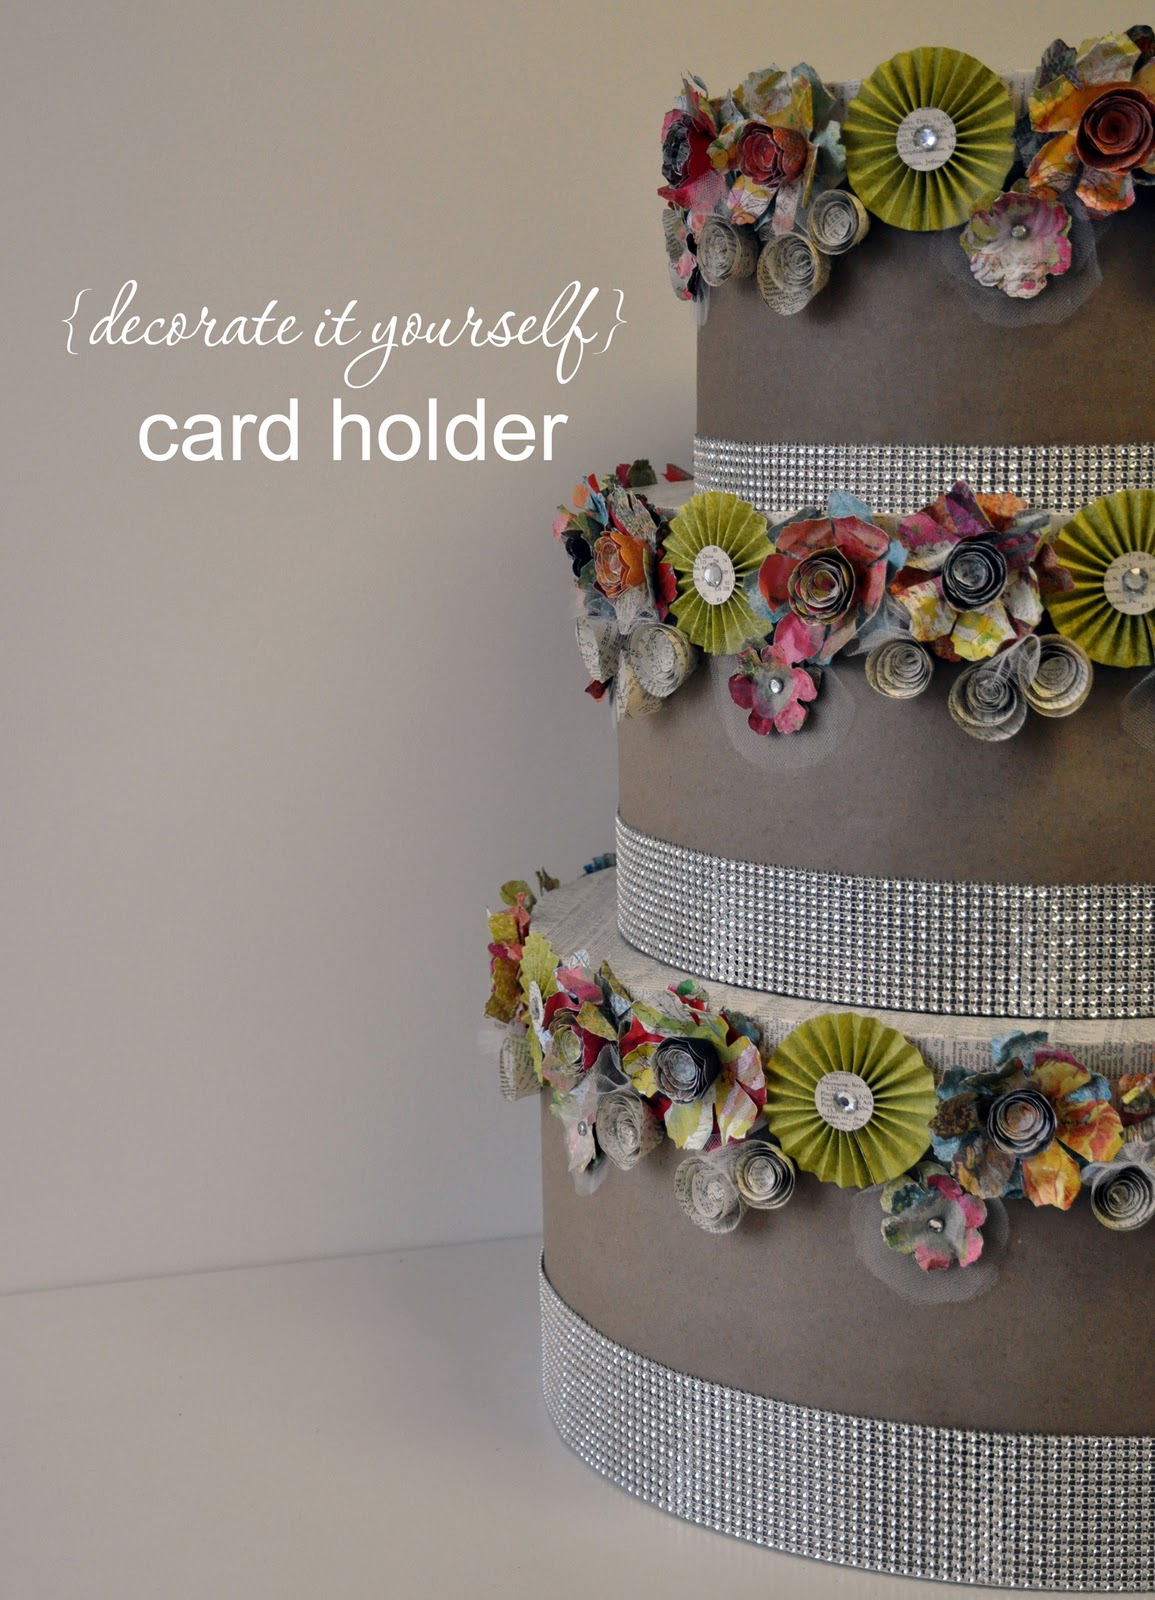 The creative bag blog decorate it yourself wedding card box decorate it yourself wedding card box tuesday 24 january 2012 solutioingenieria Choice Image